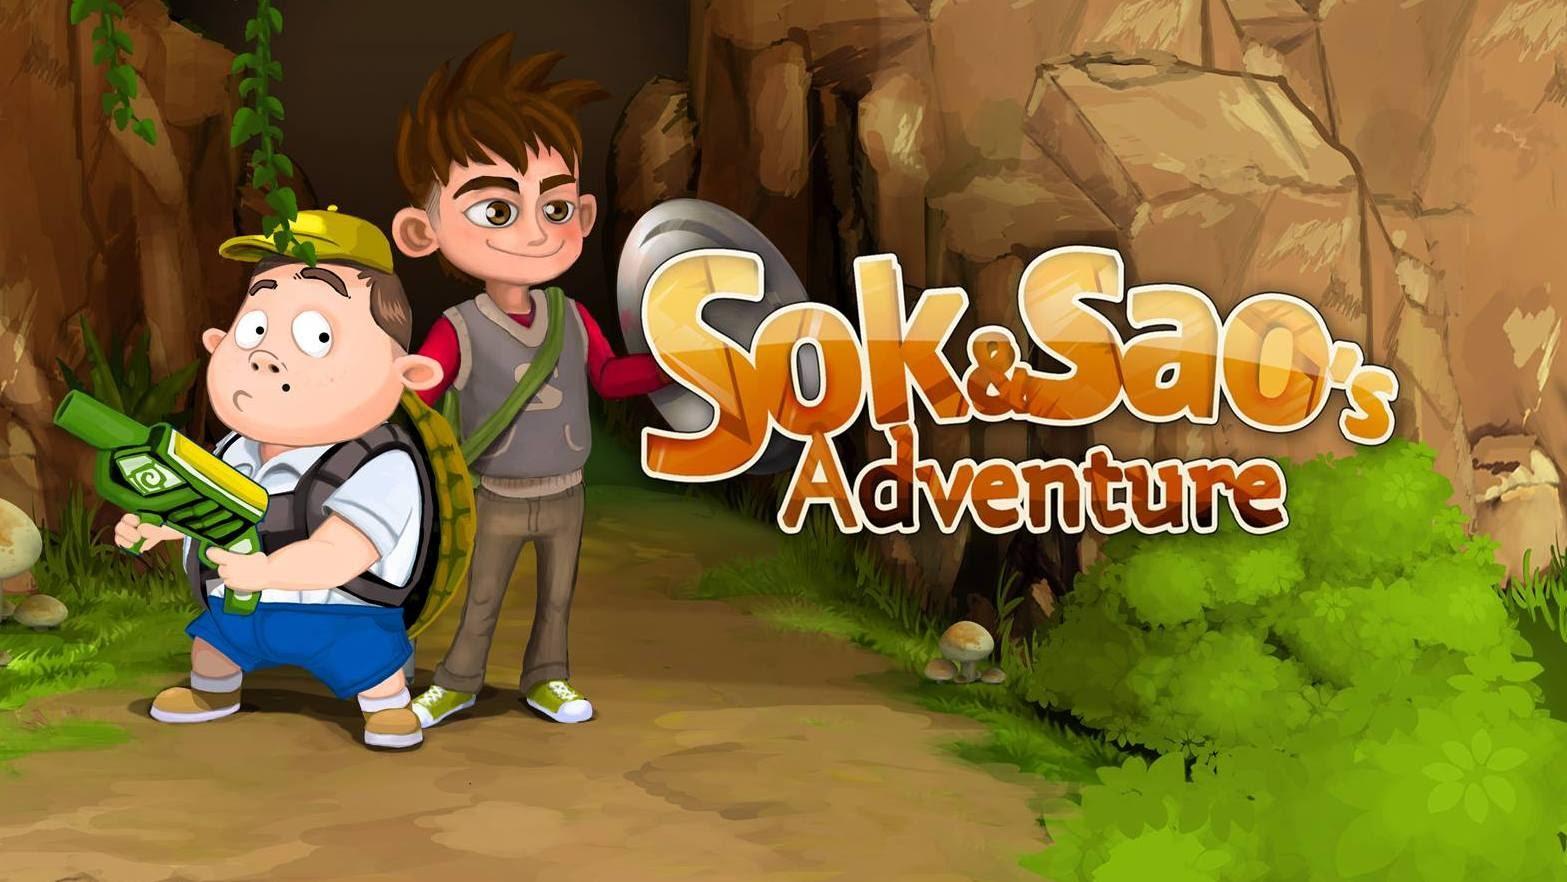 Sok and Sao's Aventure